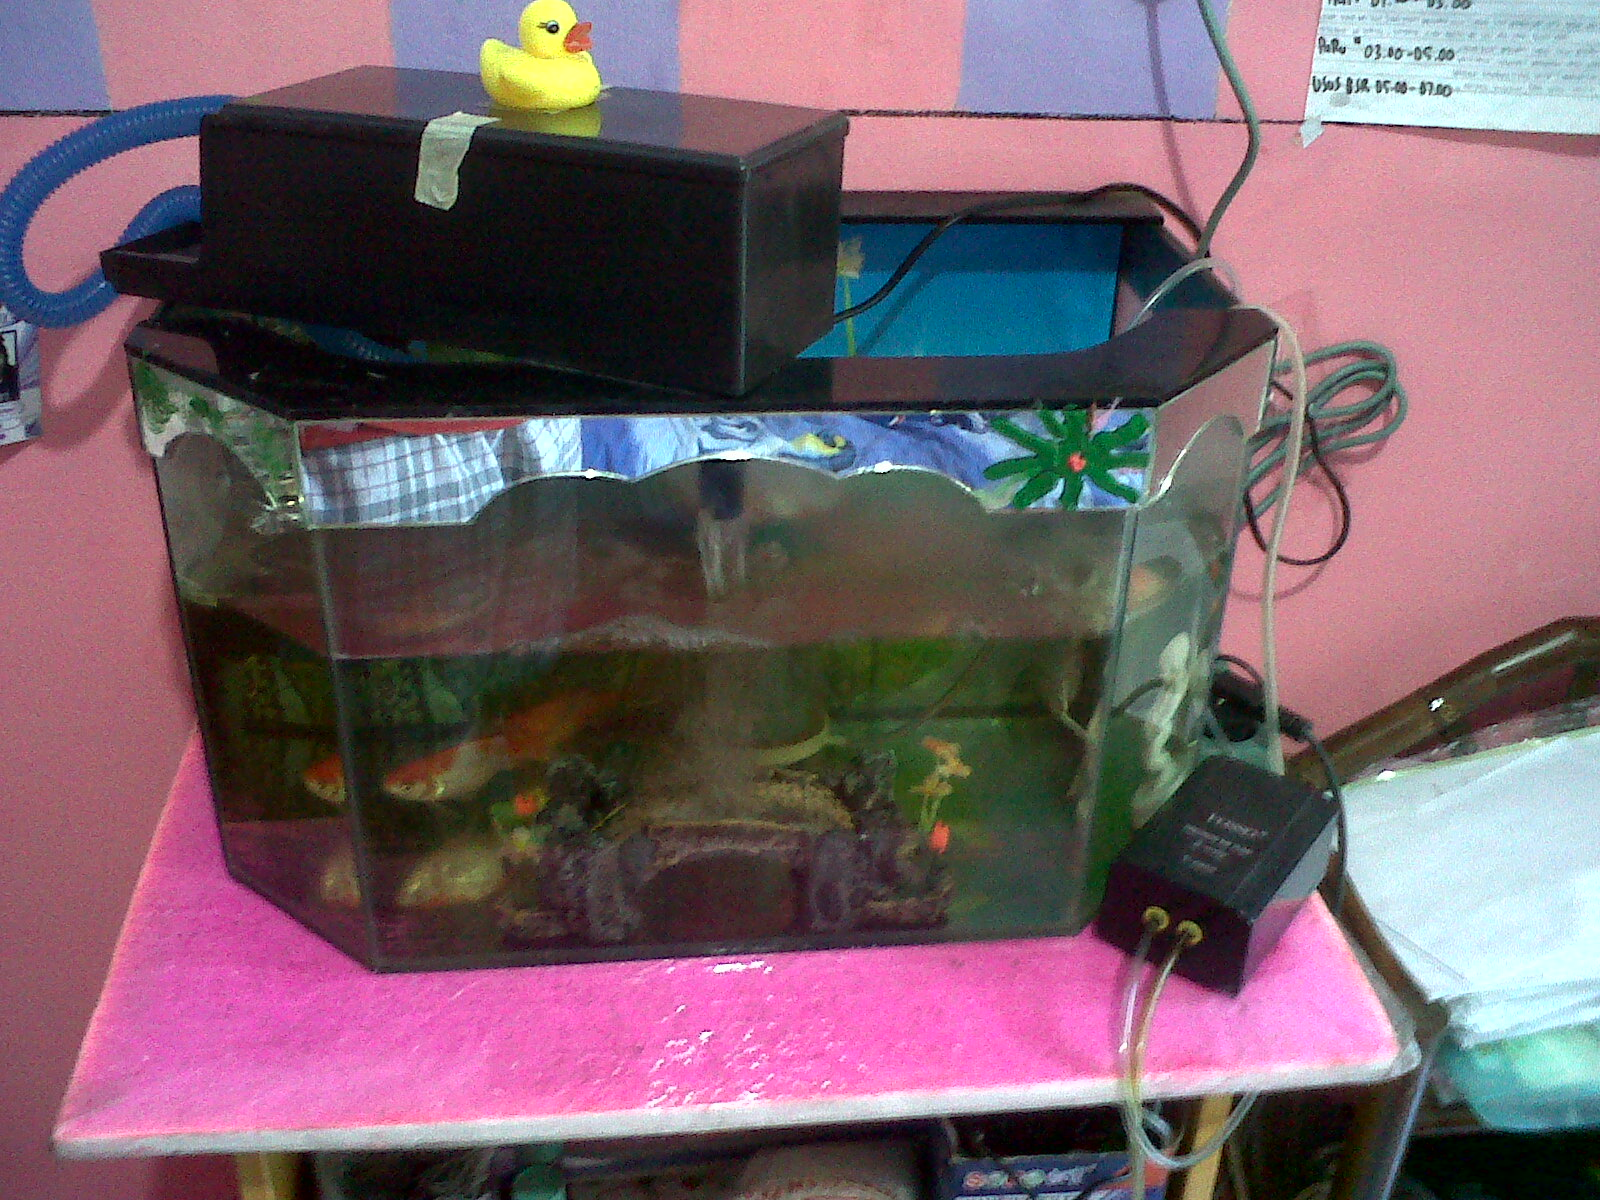 Aquarium dengan ukuran 60x75 cm, terbuat dari kaca setebal 3ml. mampu ...